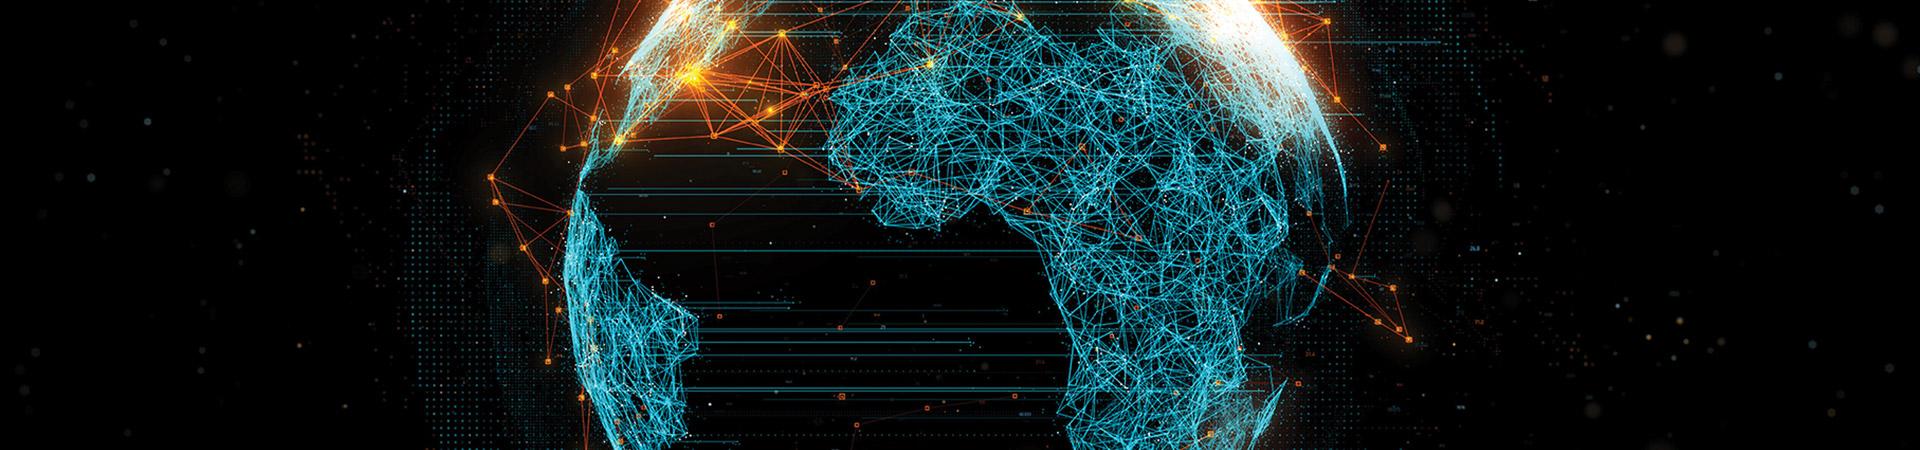 Data Modernization and Digital Transformation